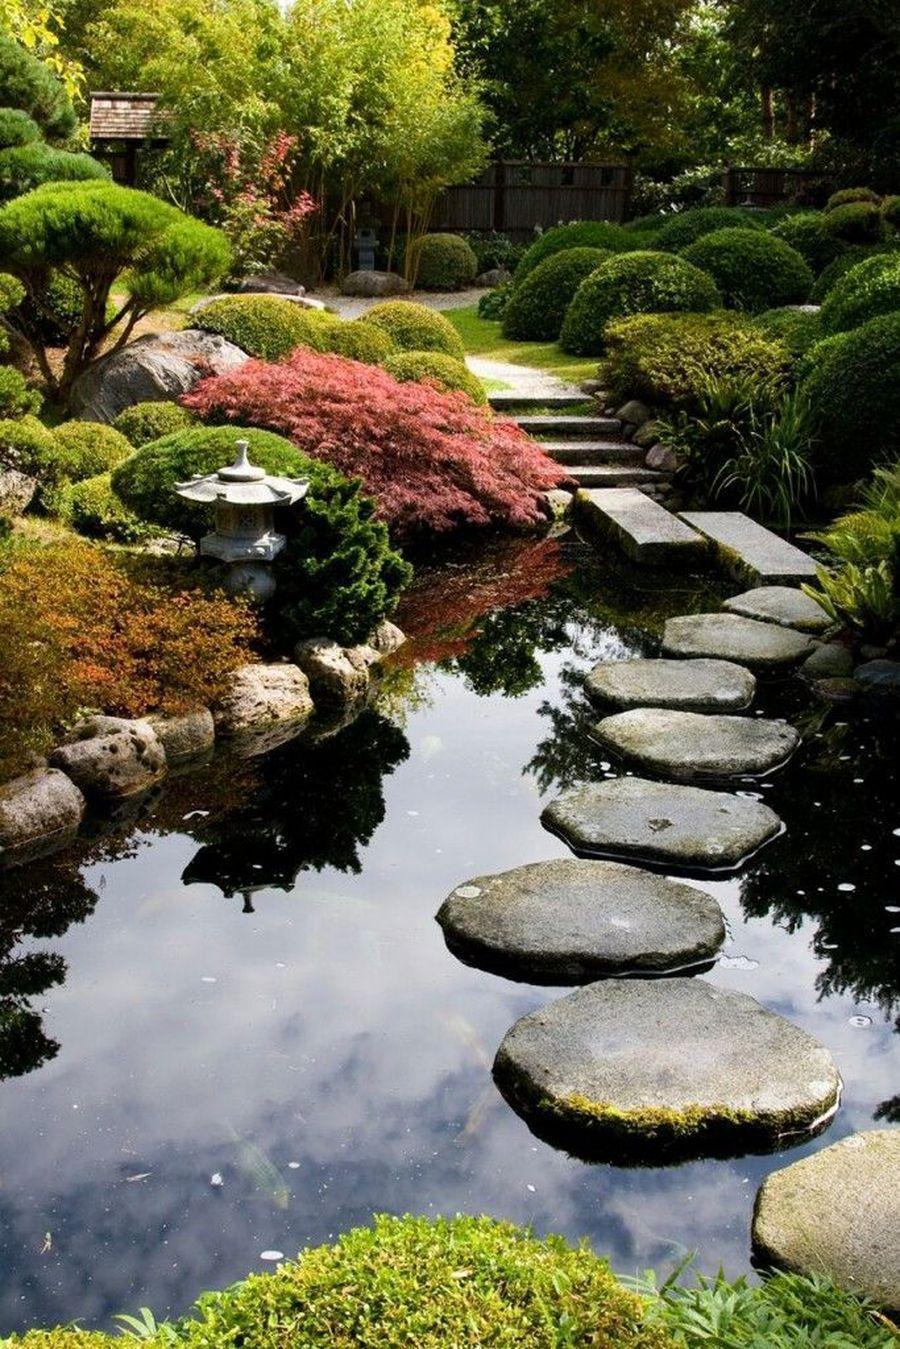 Peacefully Japanese Zen Garden Gallery Inspirations 92 Rockindeco Japanese Garden Landscape Portland Japanese Garden Japanese Water Gardens Backyard zen garden pond